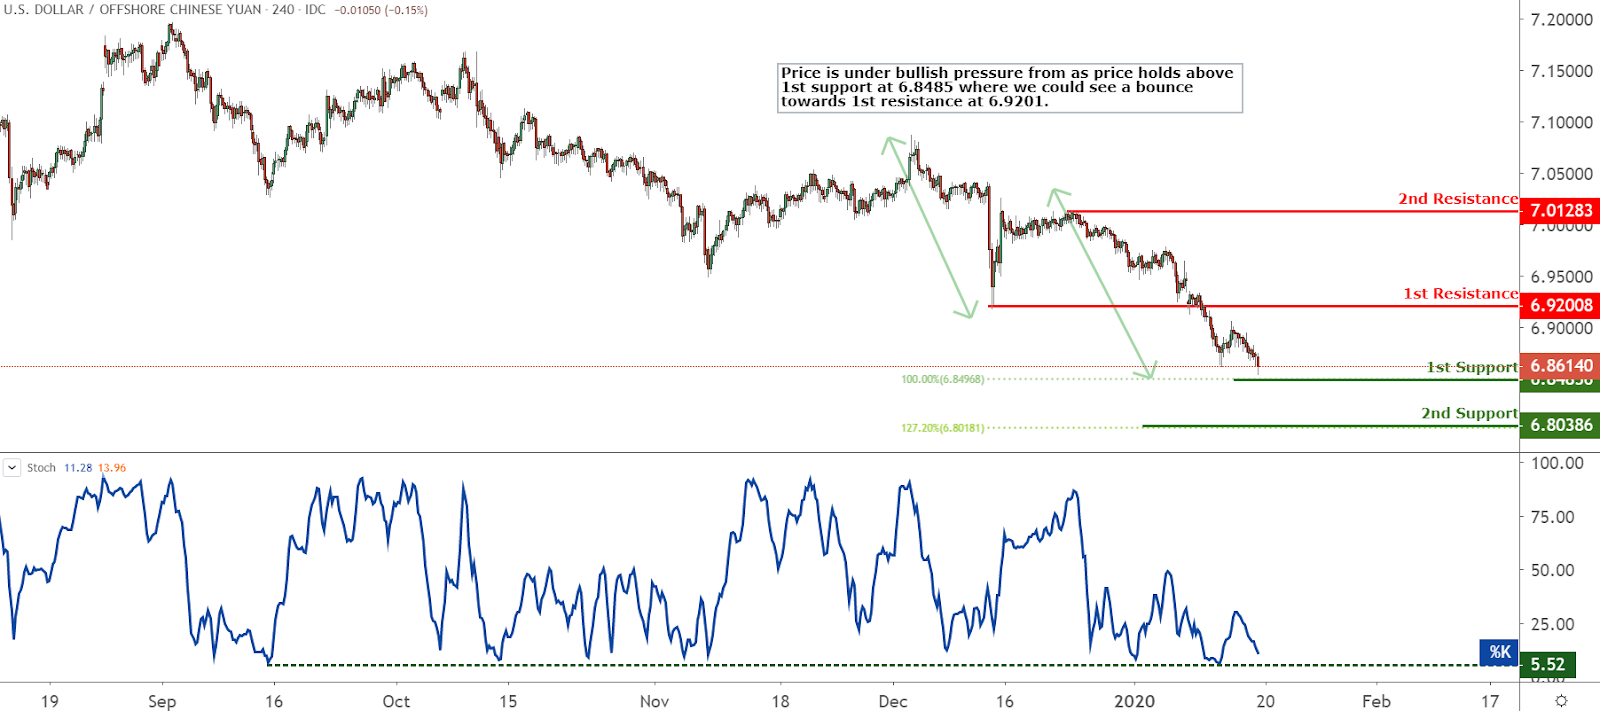 USDCNH Chart, Source: TradingView.com